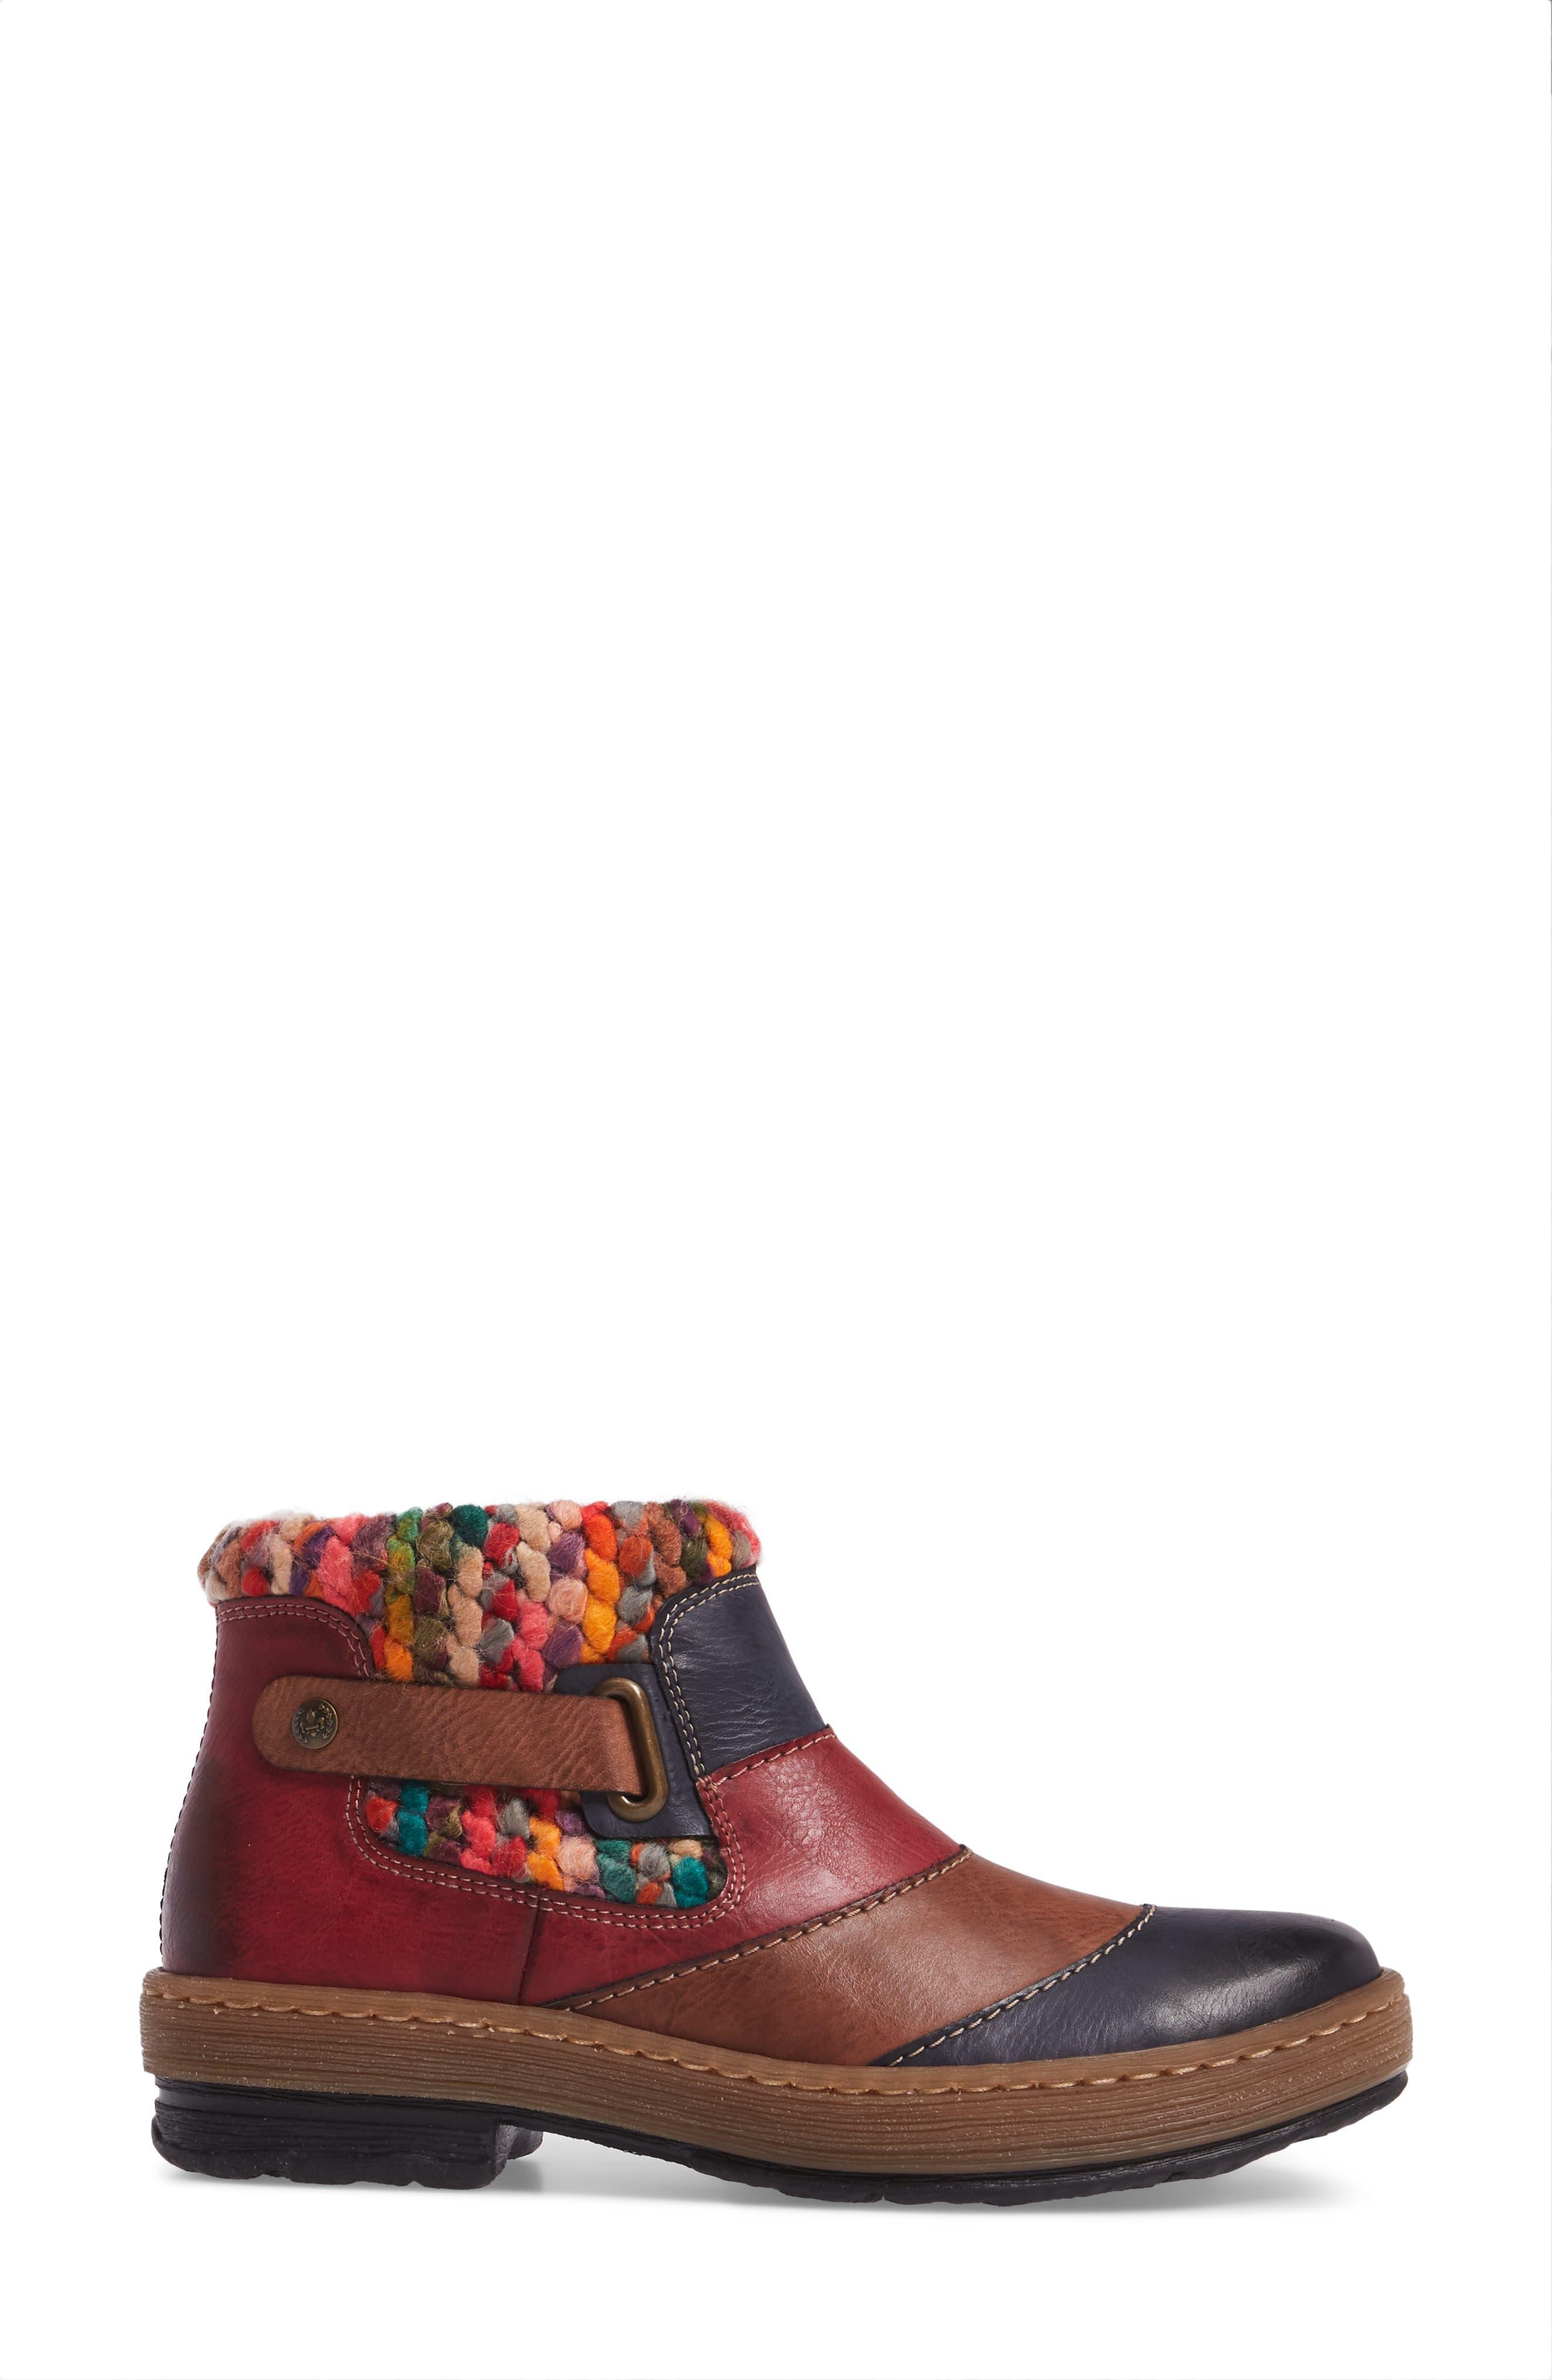 Felicitas 82 Boot,                             Alternate thumbnail 2, color,                             Ocean Multi Faux Leather